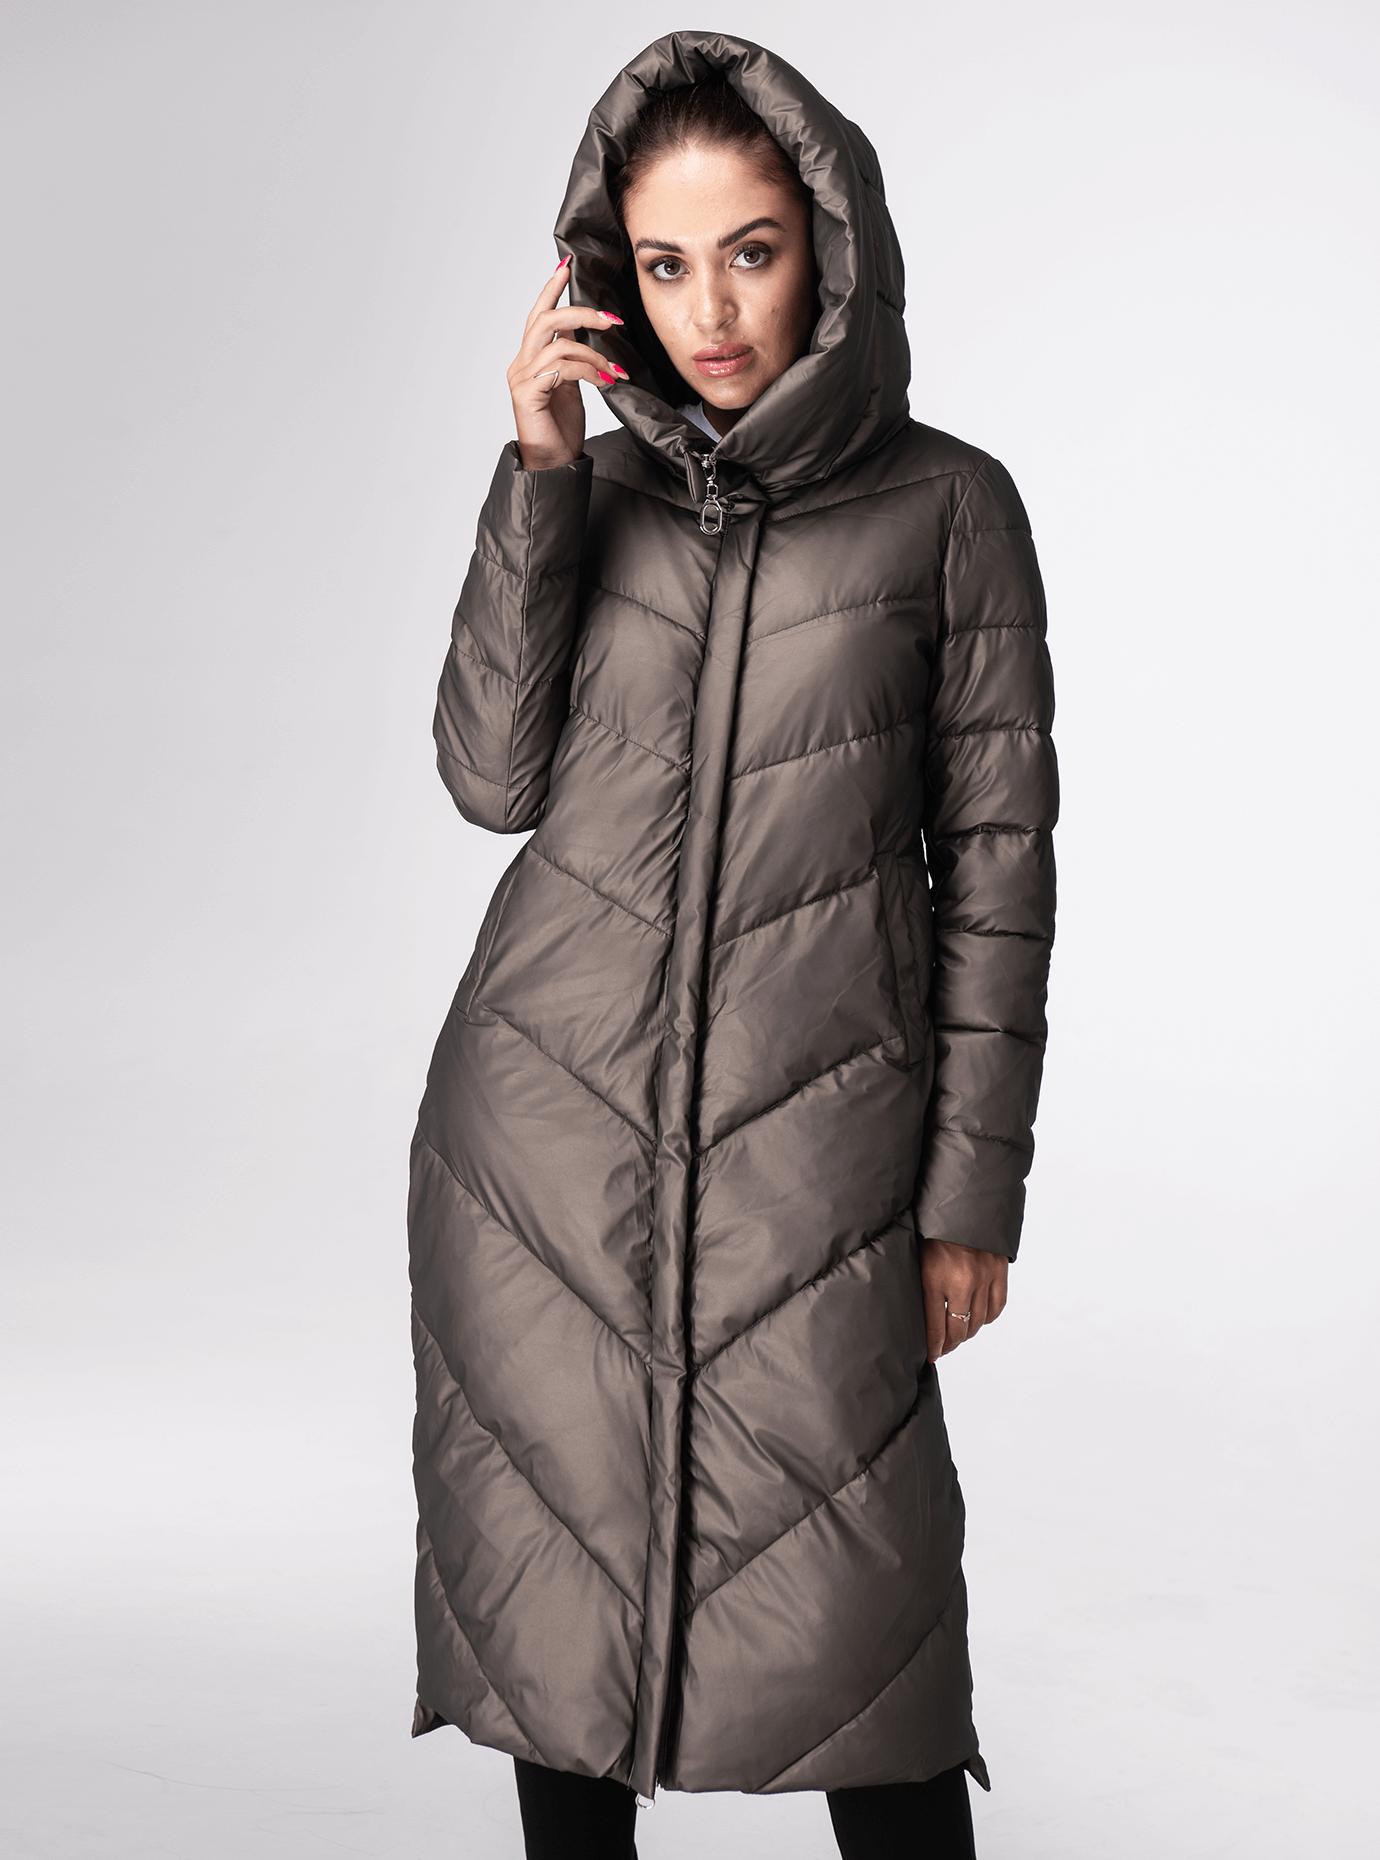 Куртка зимова пряма з капюшоном Коричневий M (05-ZL2223): фото - Alster.ua